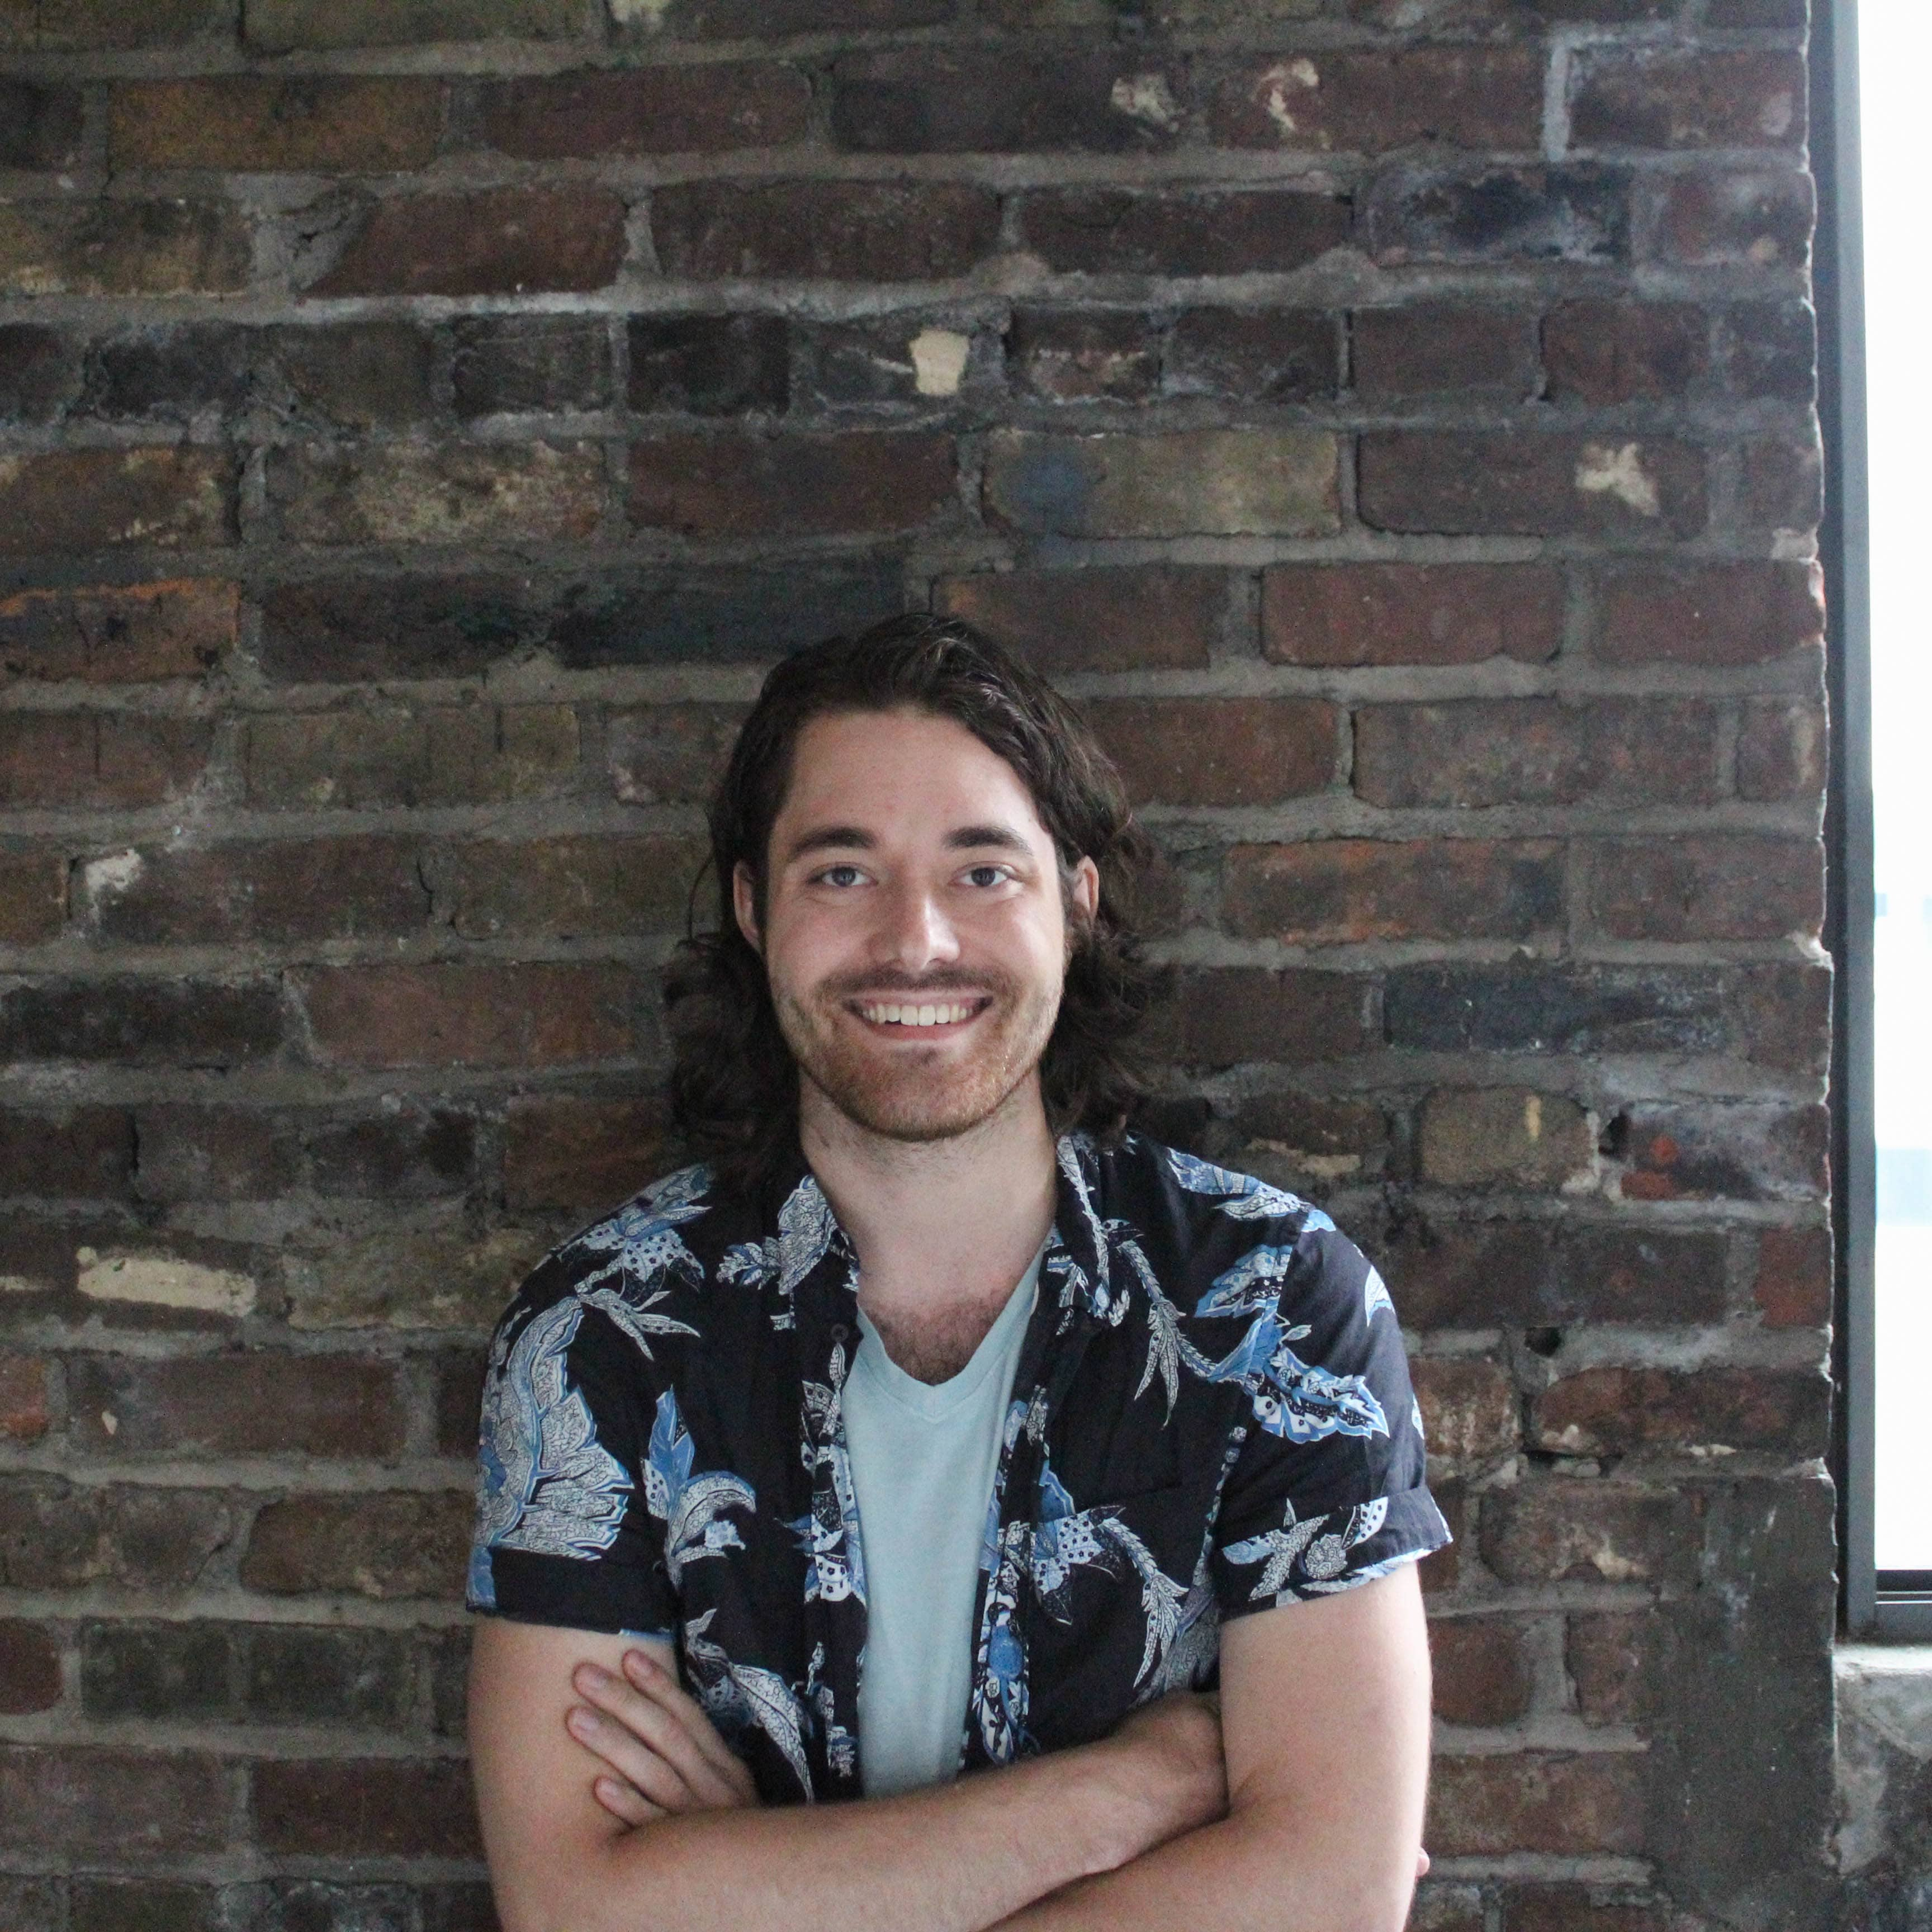 Awesome Inc team member, Zach Woodlridge